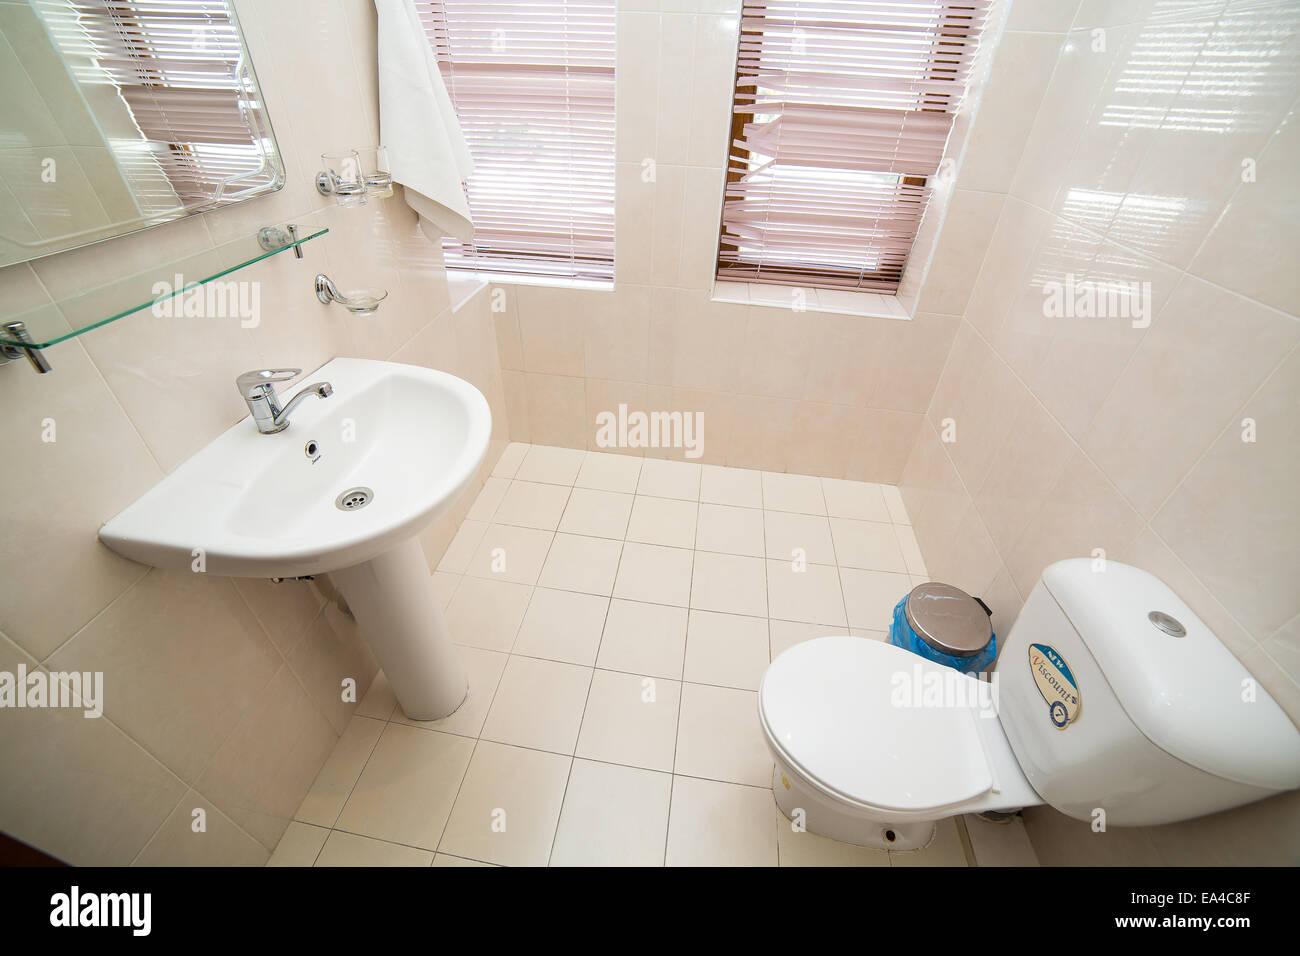 Bad, WC, Toilette, WC Raum Innenarchitektur Stockfoto, Bild ...